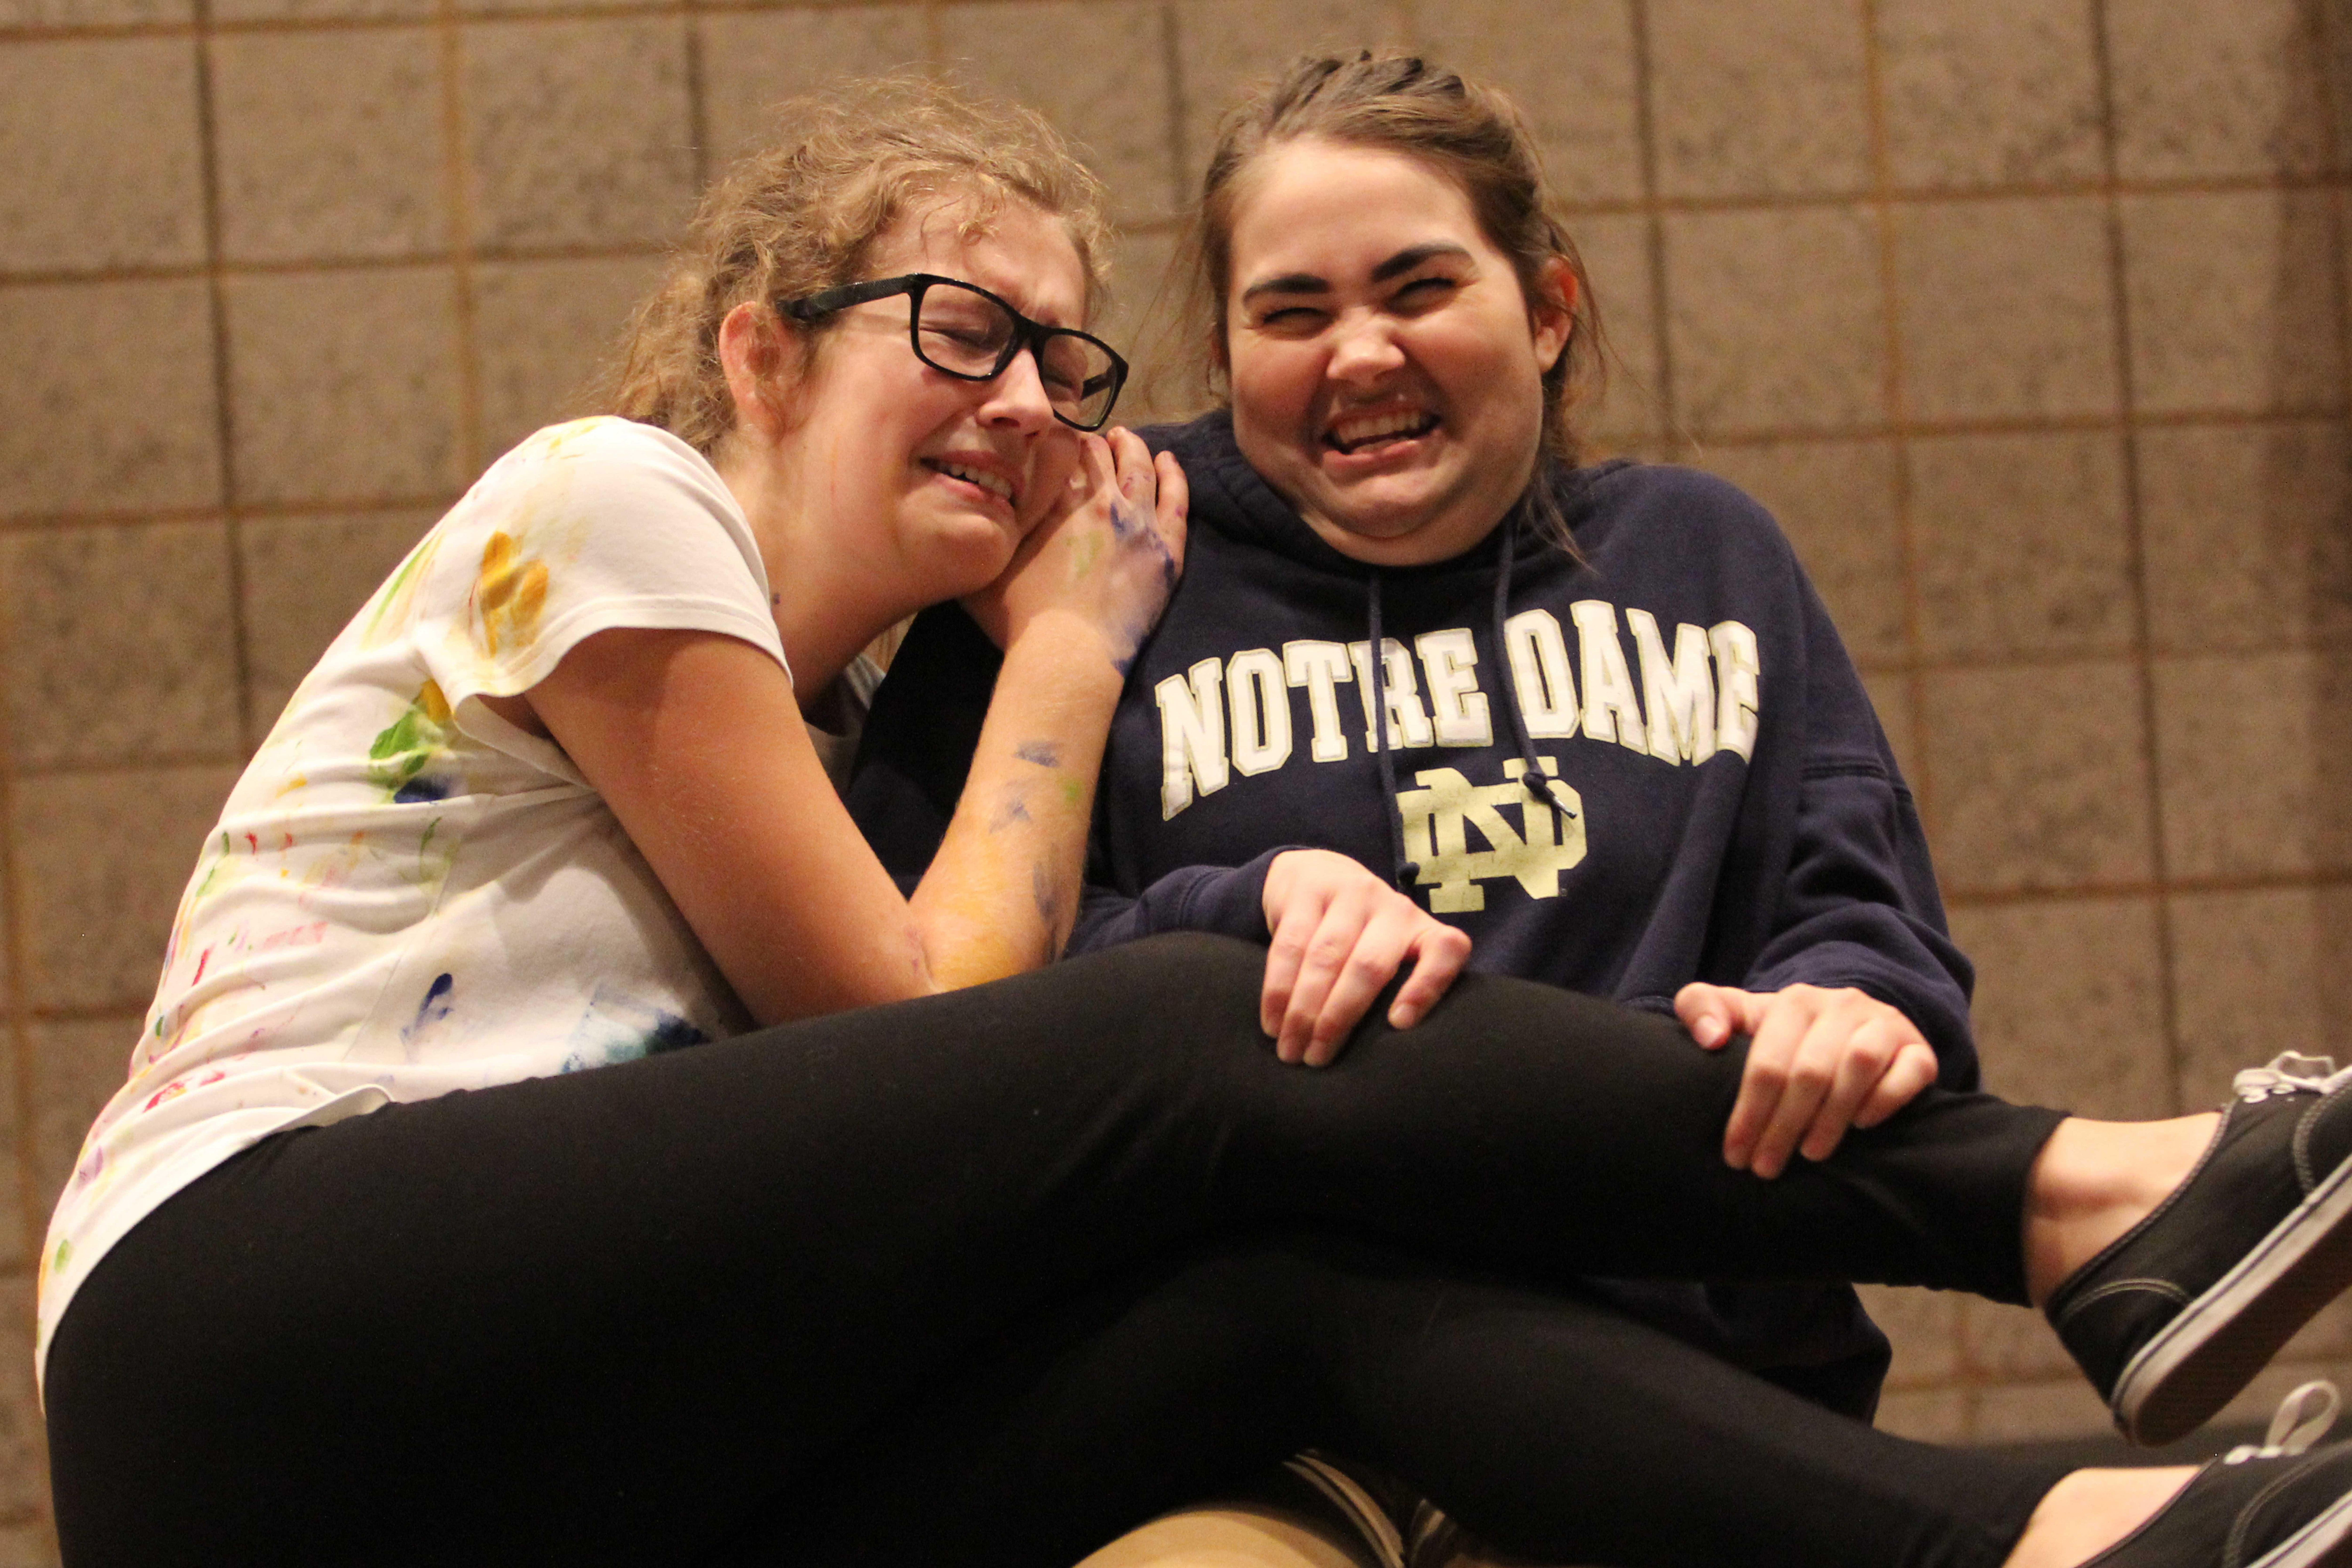 Sophia Boeckstiegel (10) cries into Megan Barry's (12) shoulder. Boeckstiegel was crying because Barry scared her.